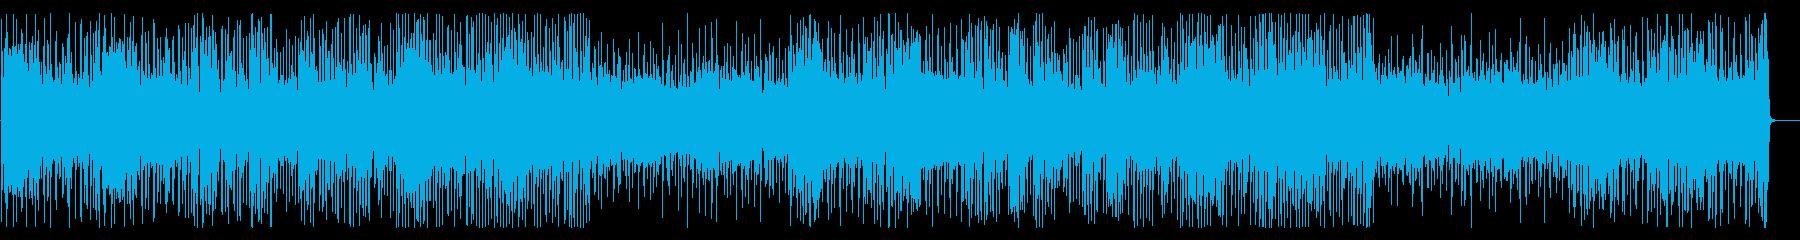 YouTube 軽快で元気なピアノの再生済みの波形